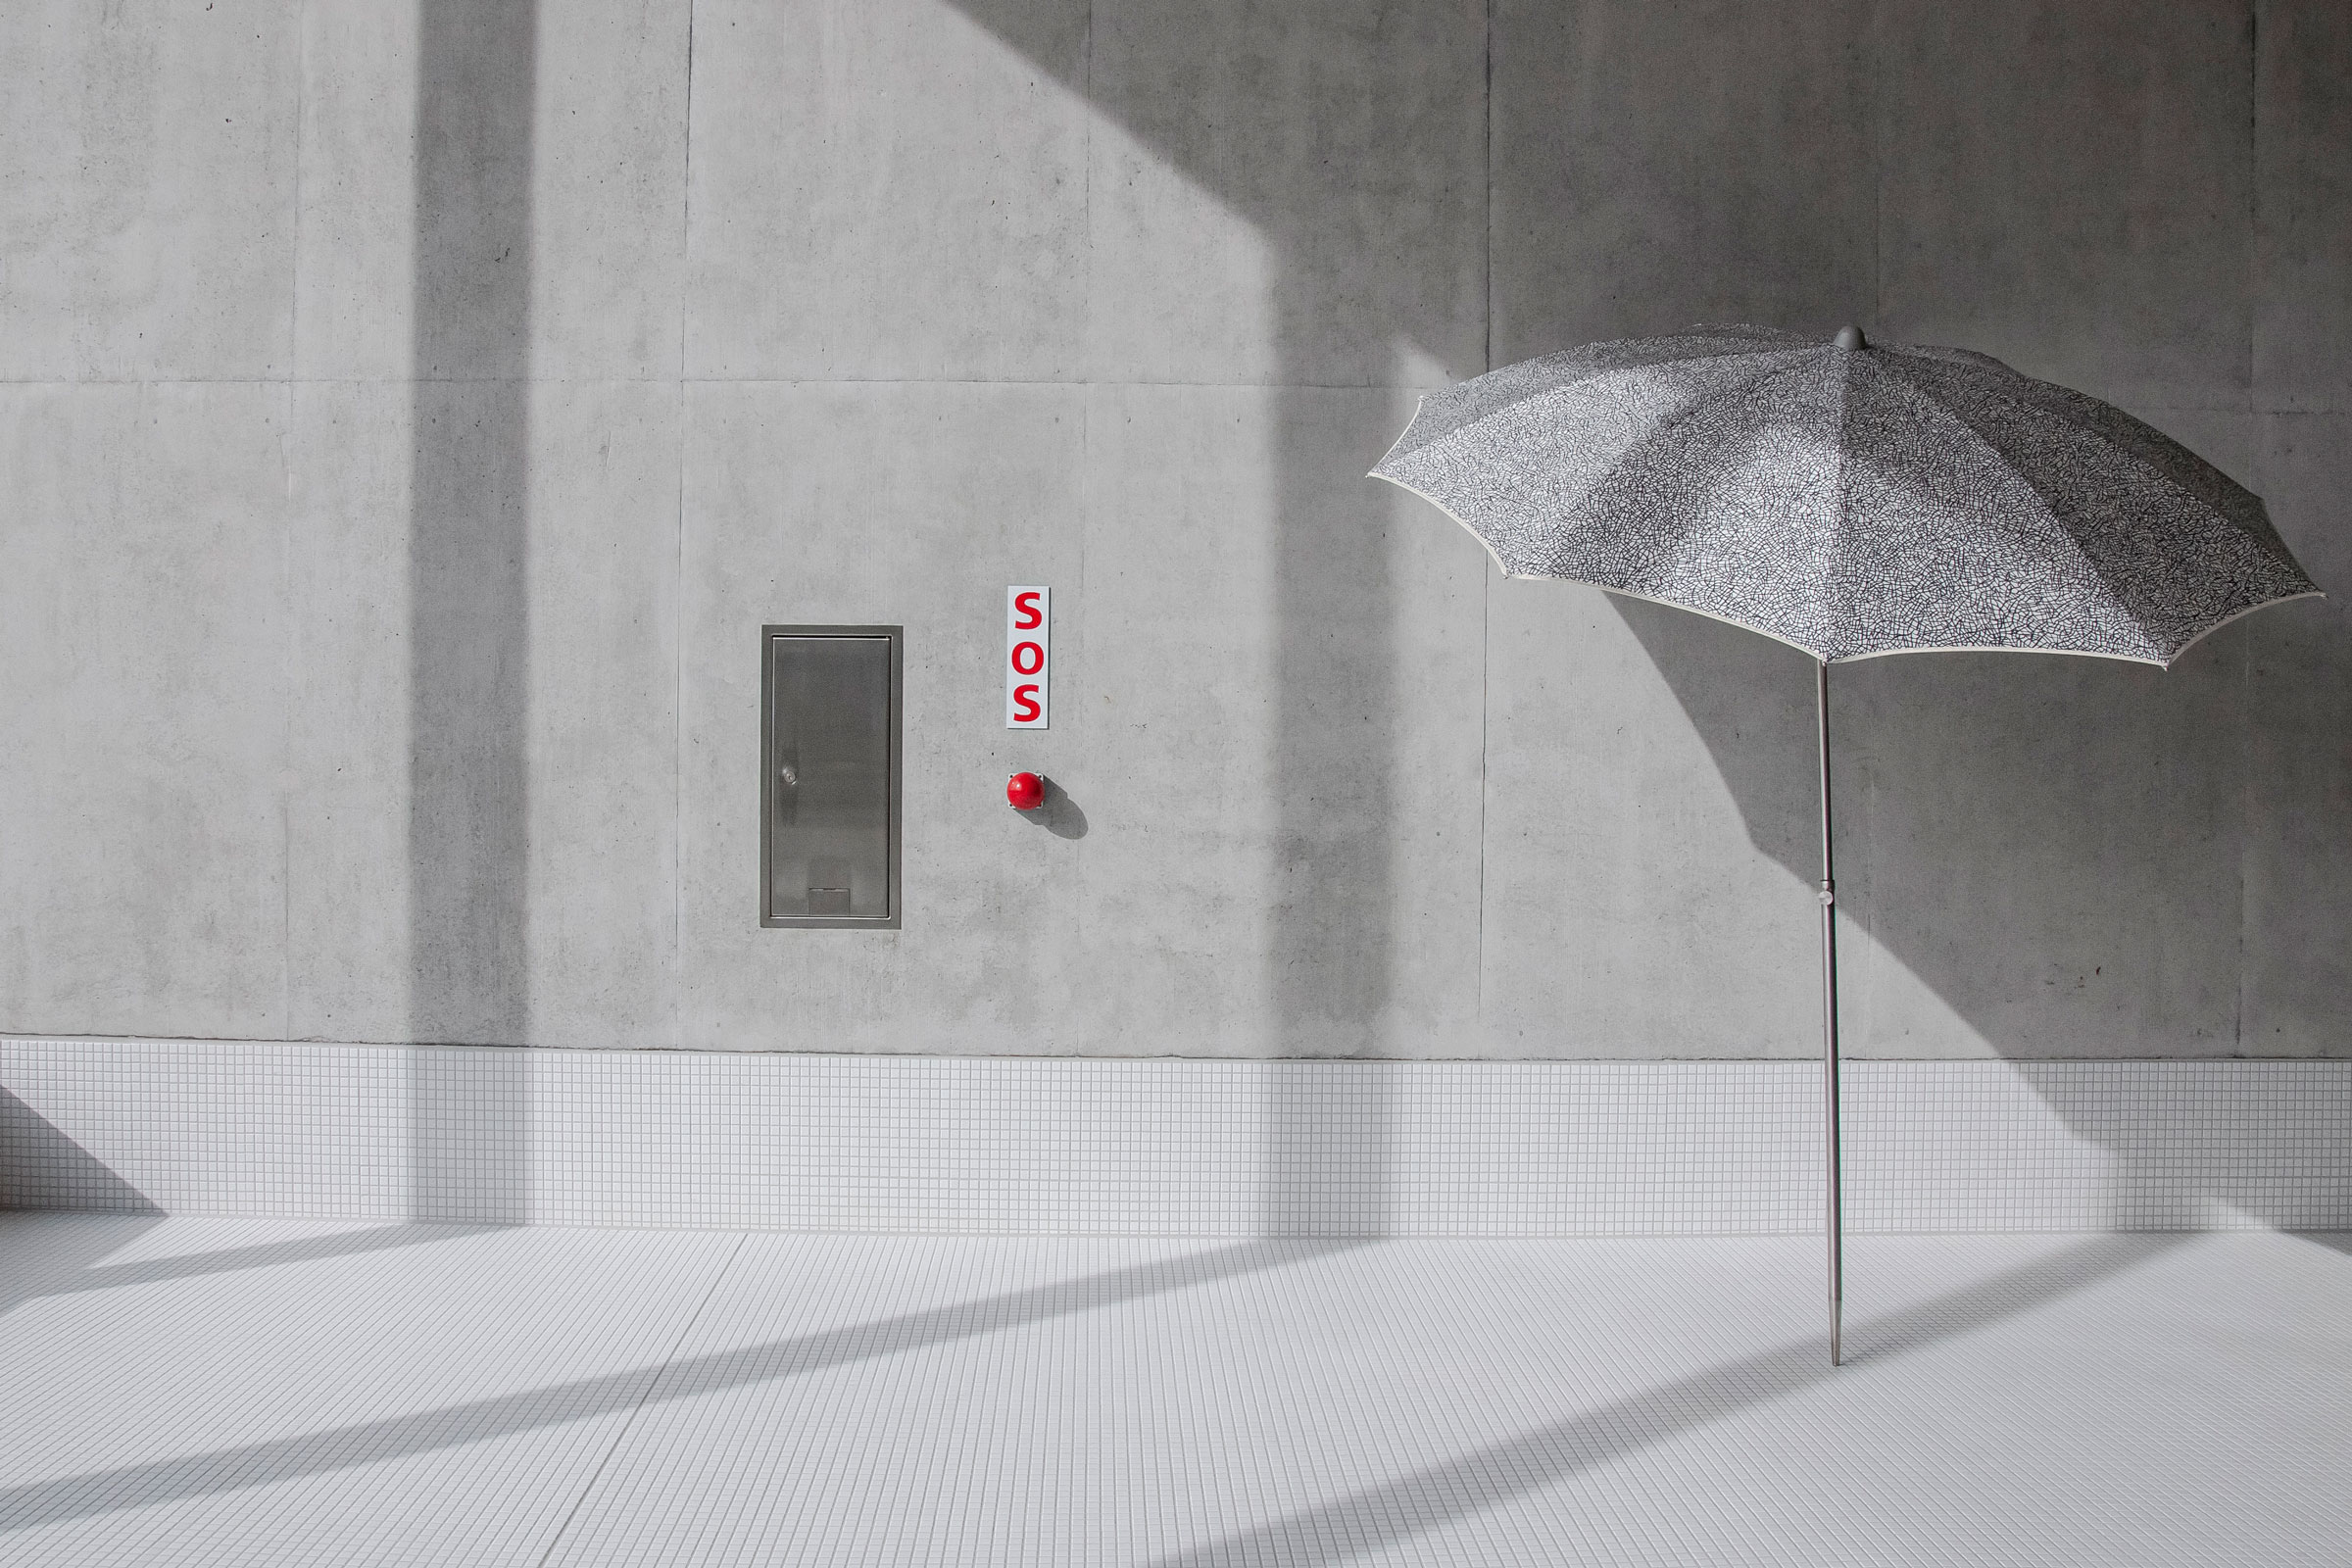 hauser-design-nima-parasol-grau-neben-sos-button